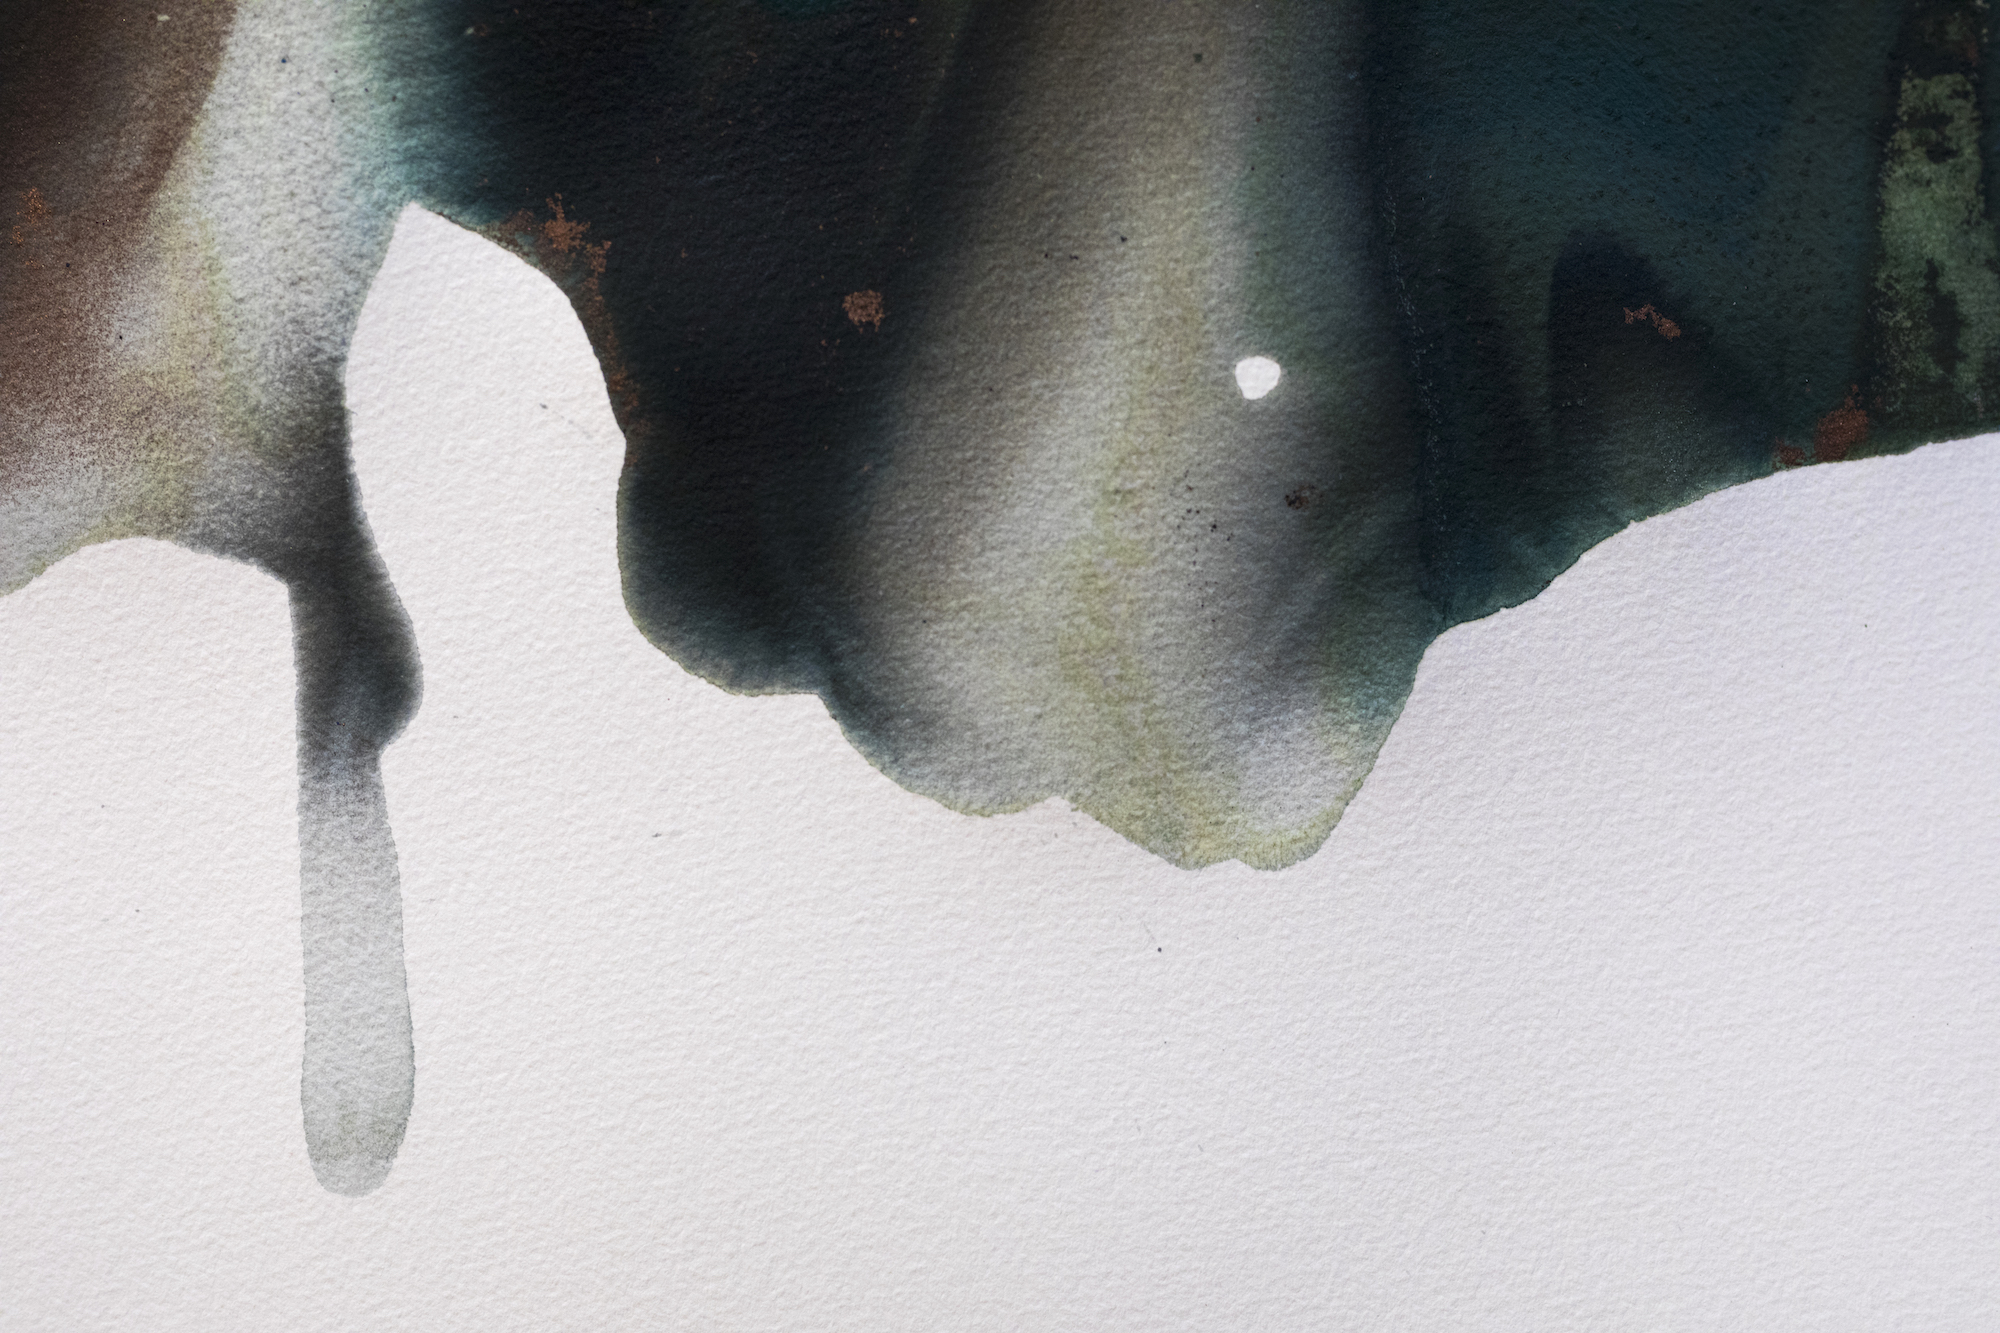 Seas and Turtle, No. 2, Birth (detail)